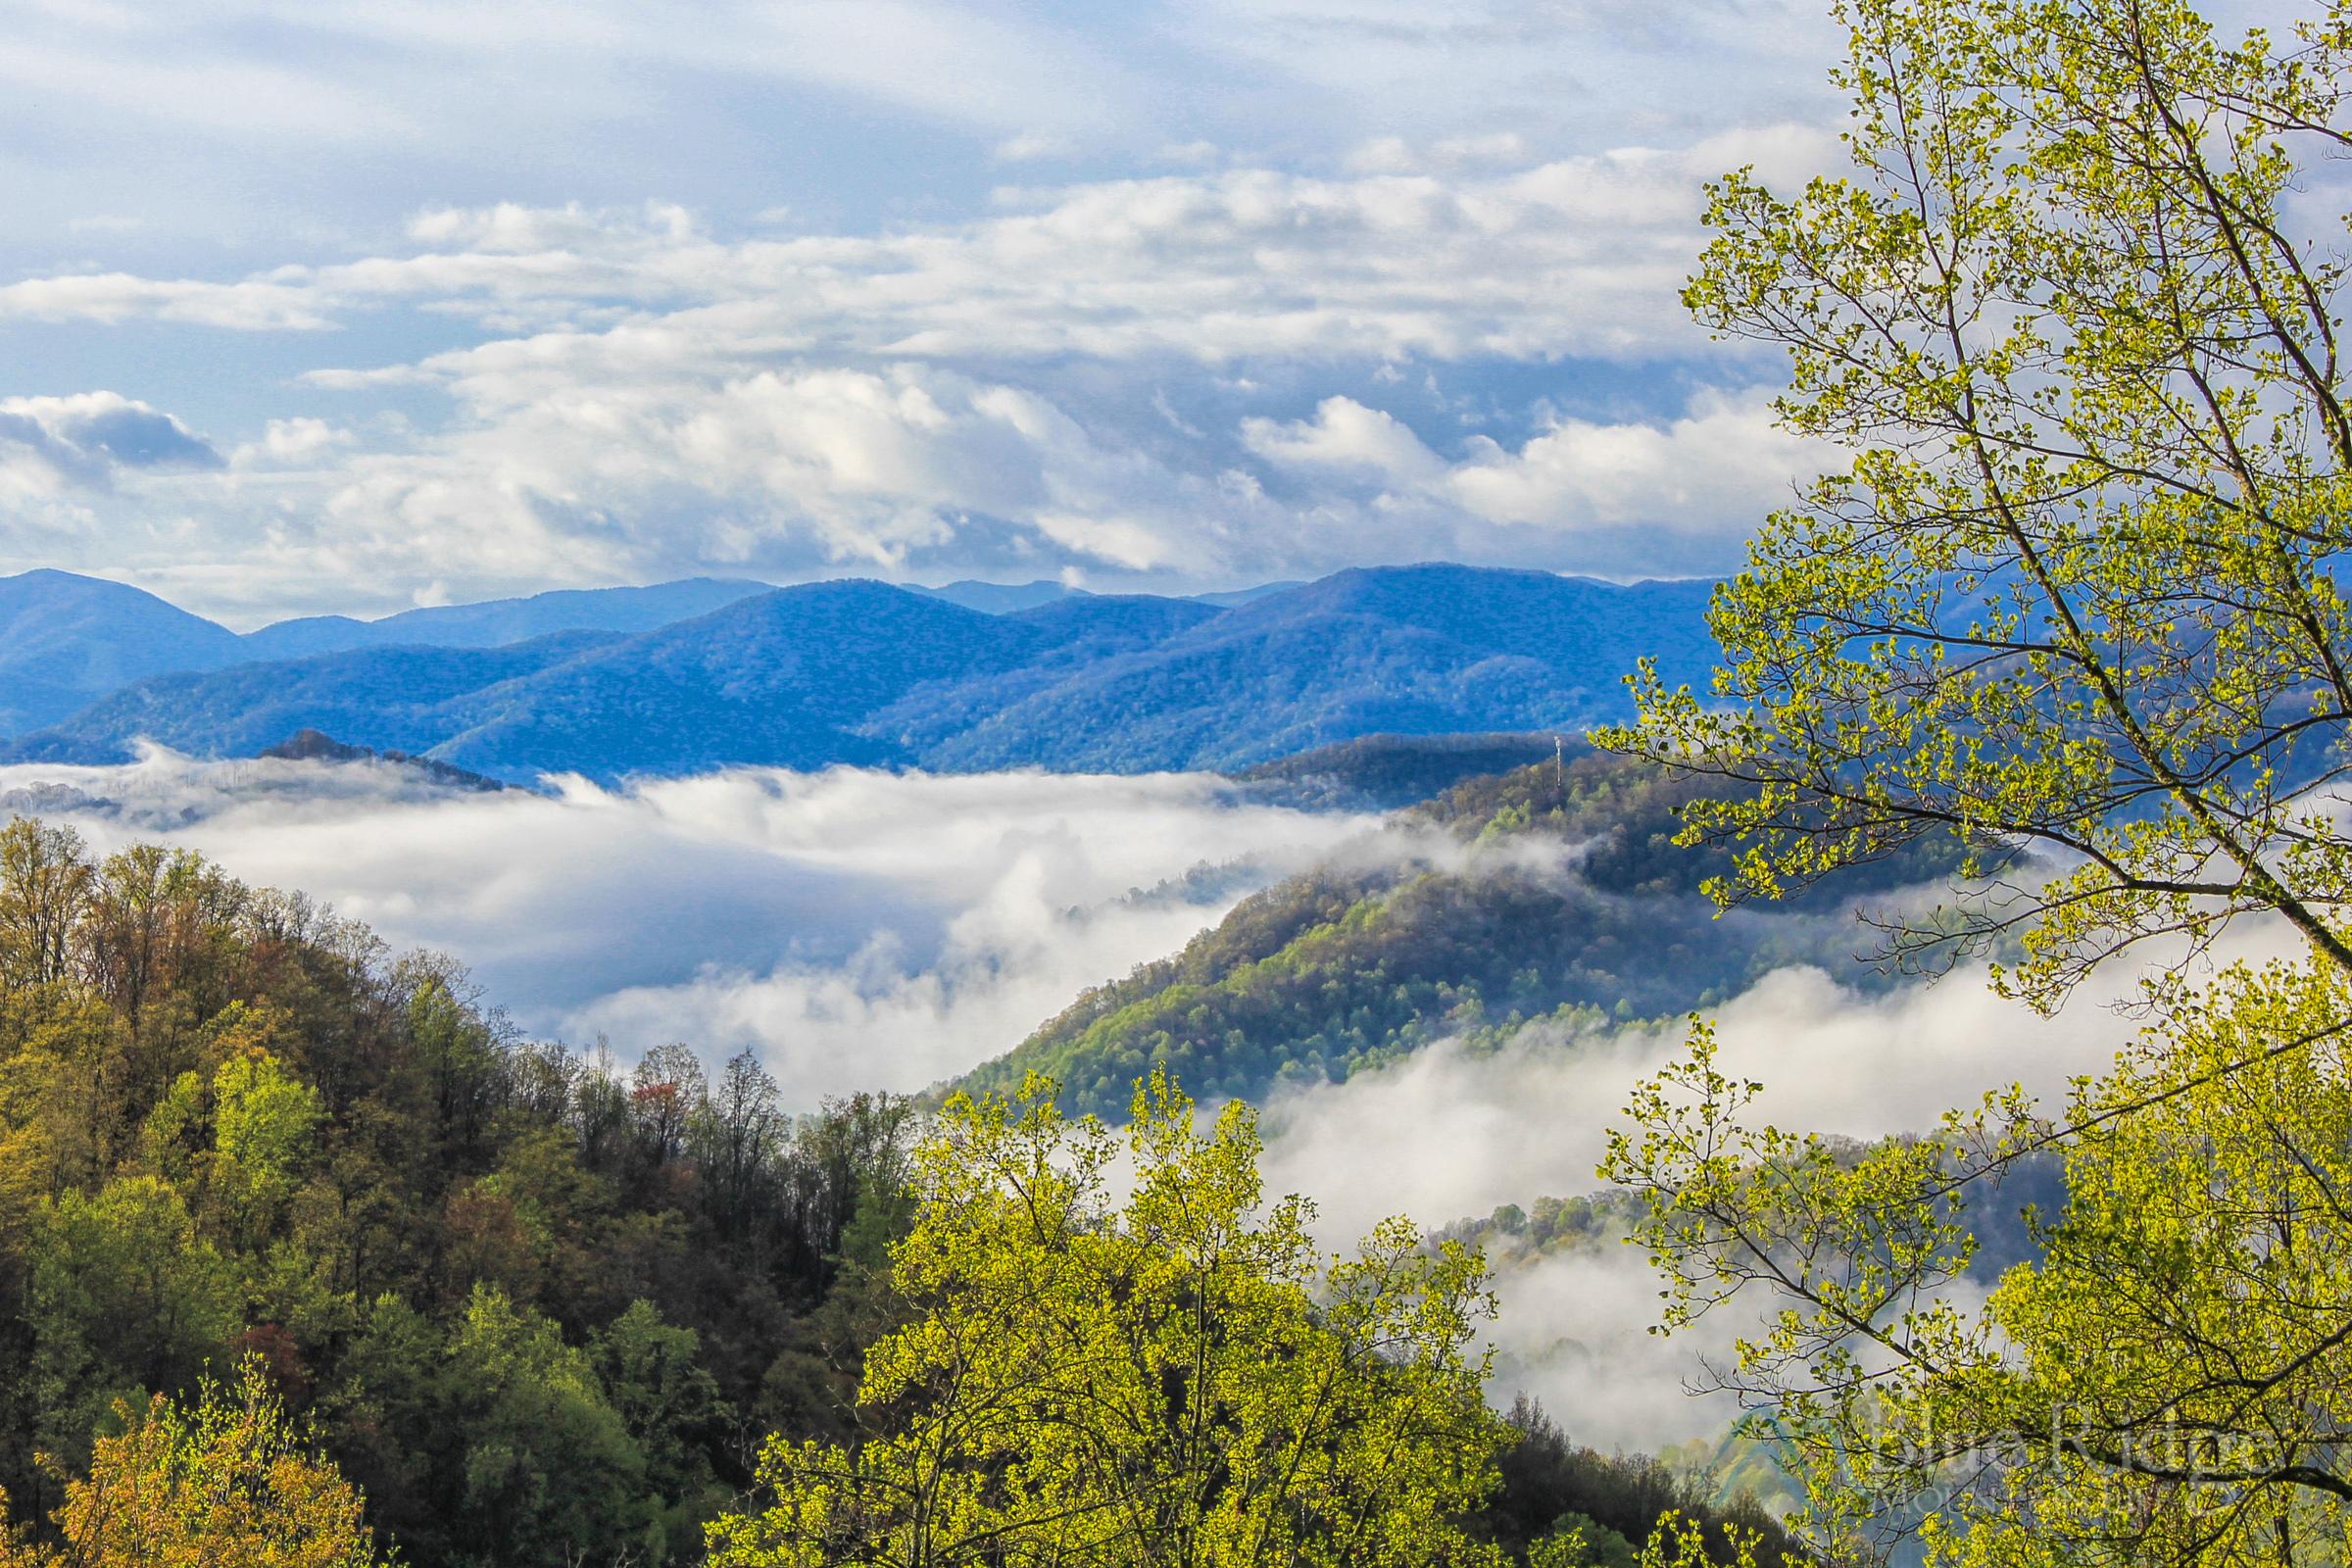 Spring in the Blue Ridge